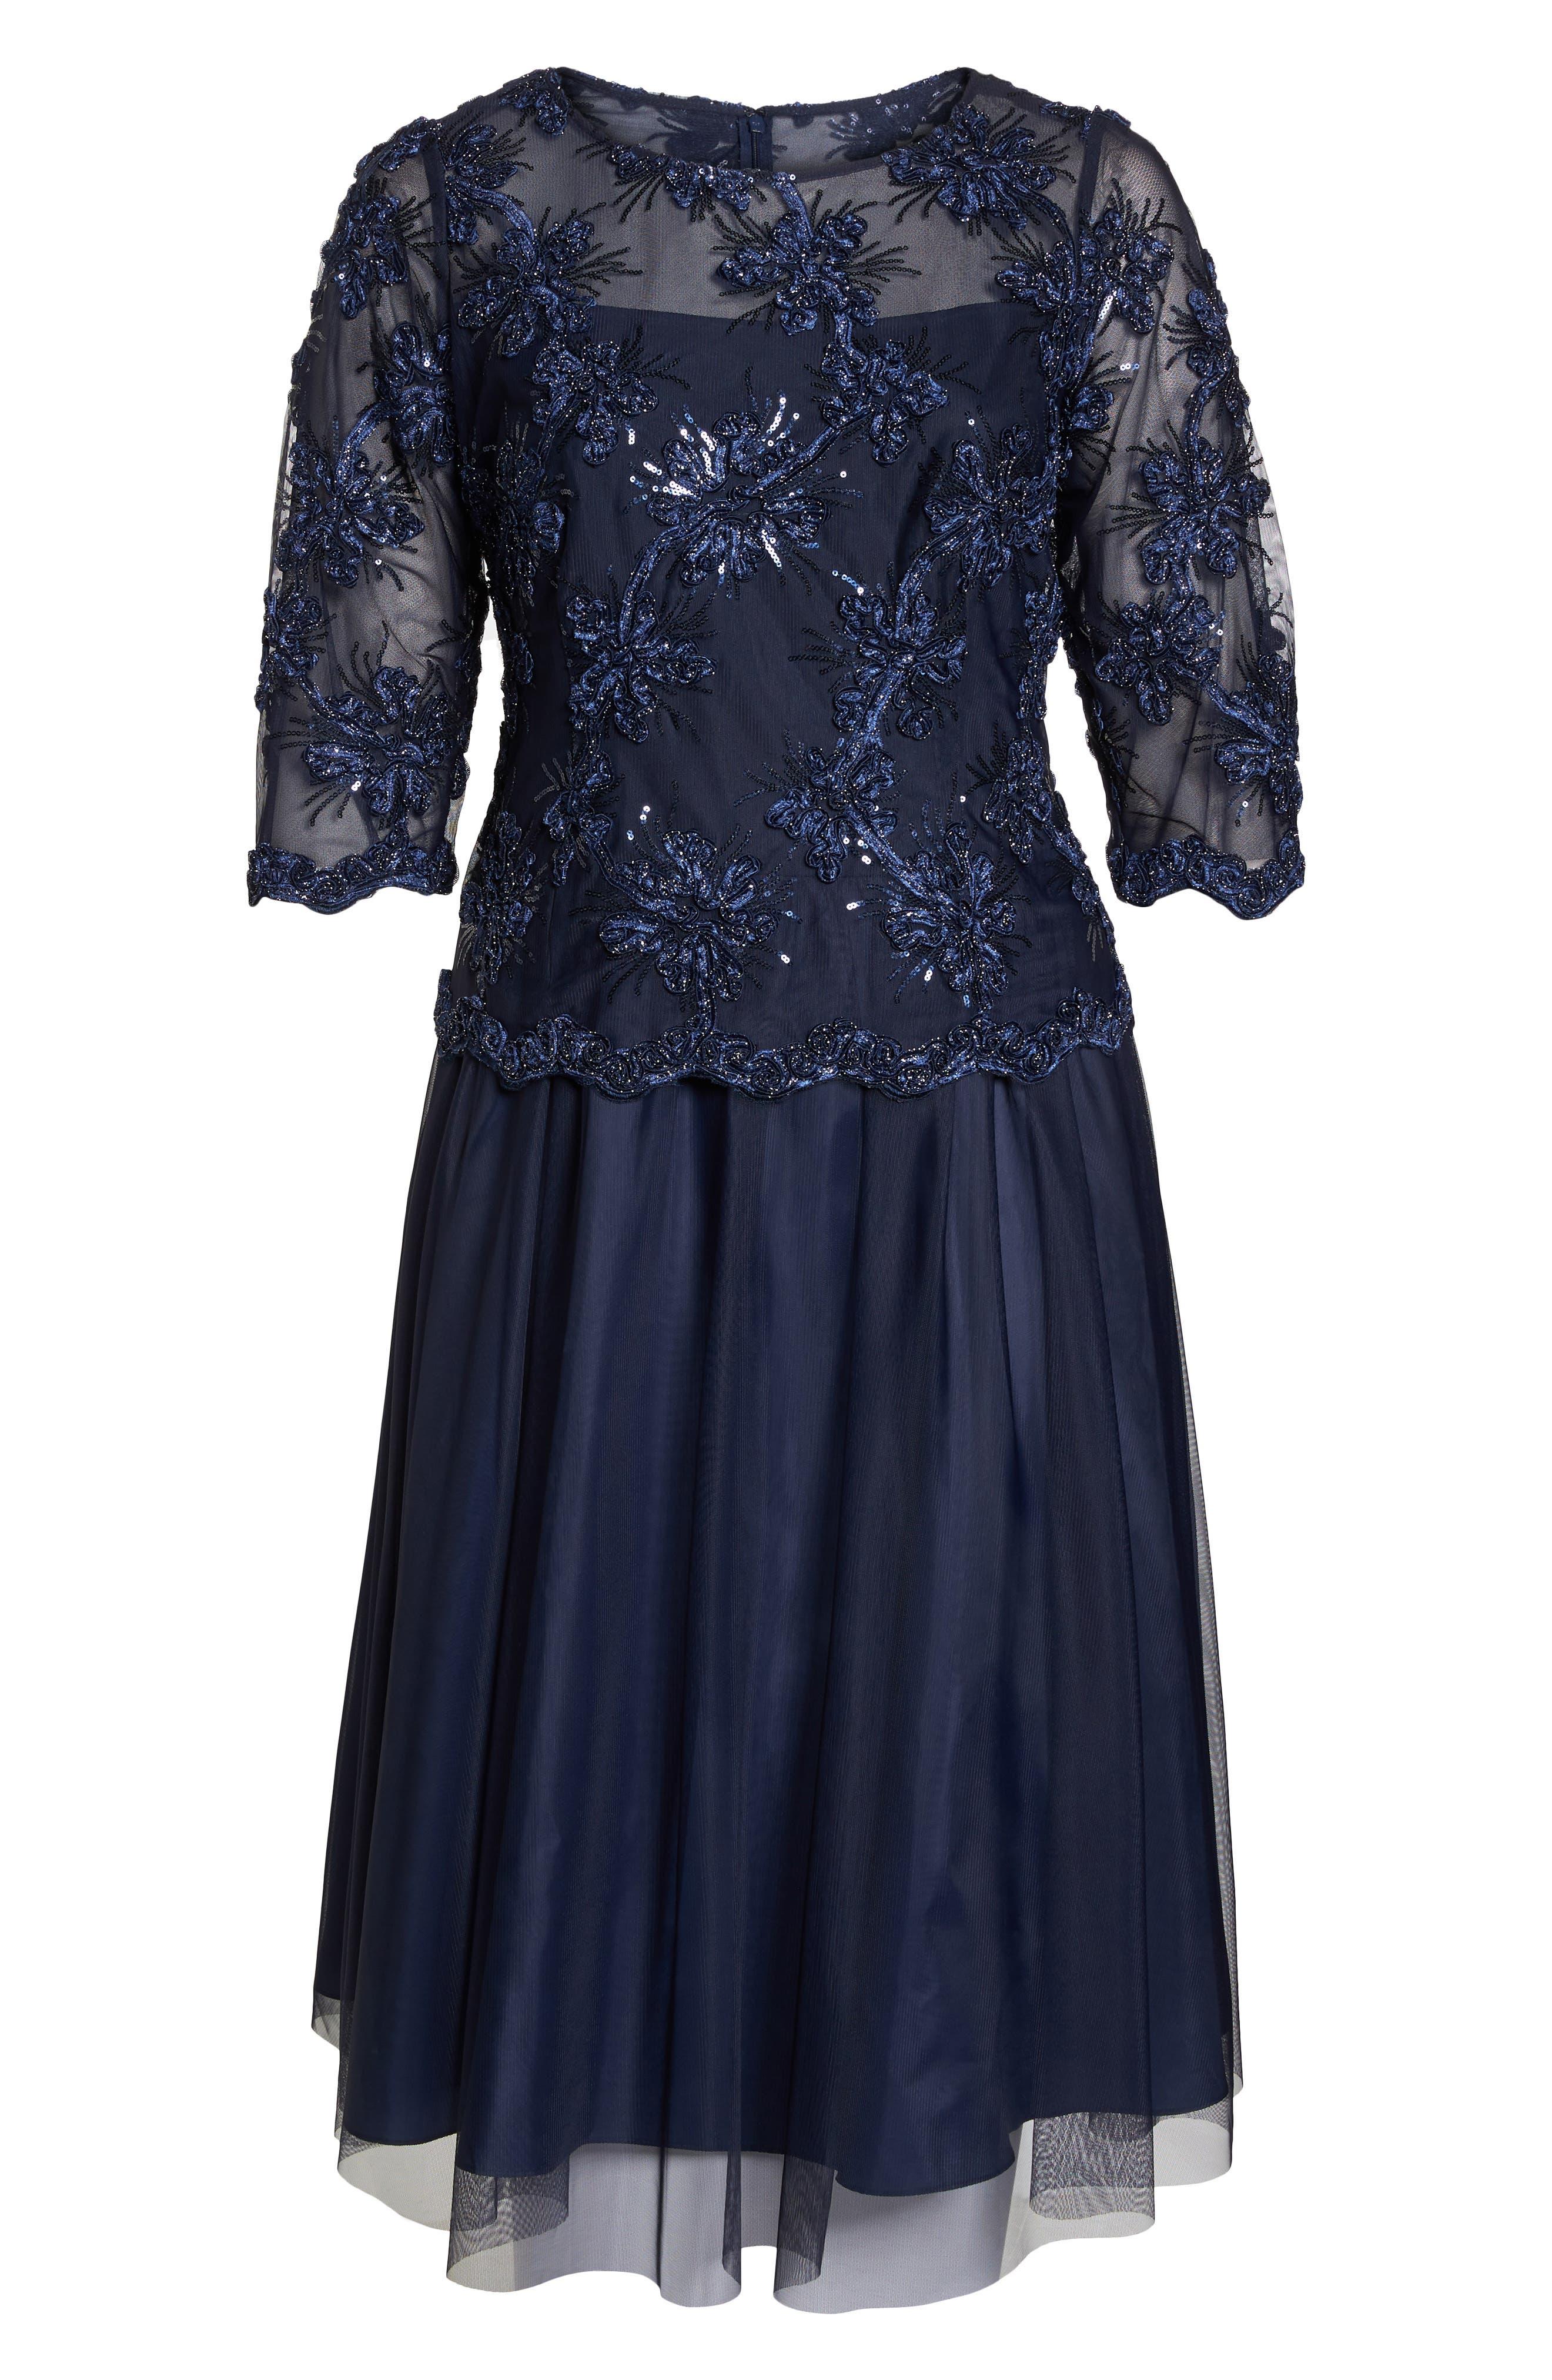 Embellished Bodice Tea Length Mesh Dress,                             Alternate thumbnail 6, color,                             410